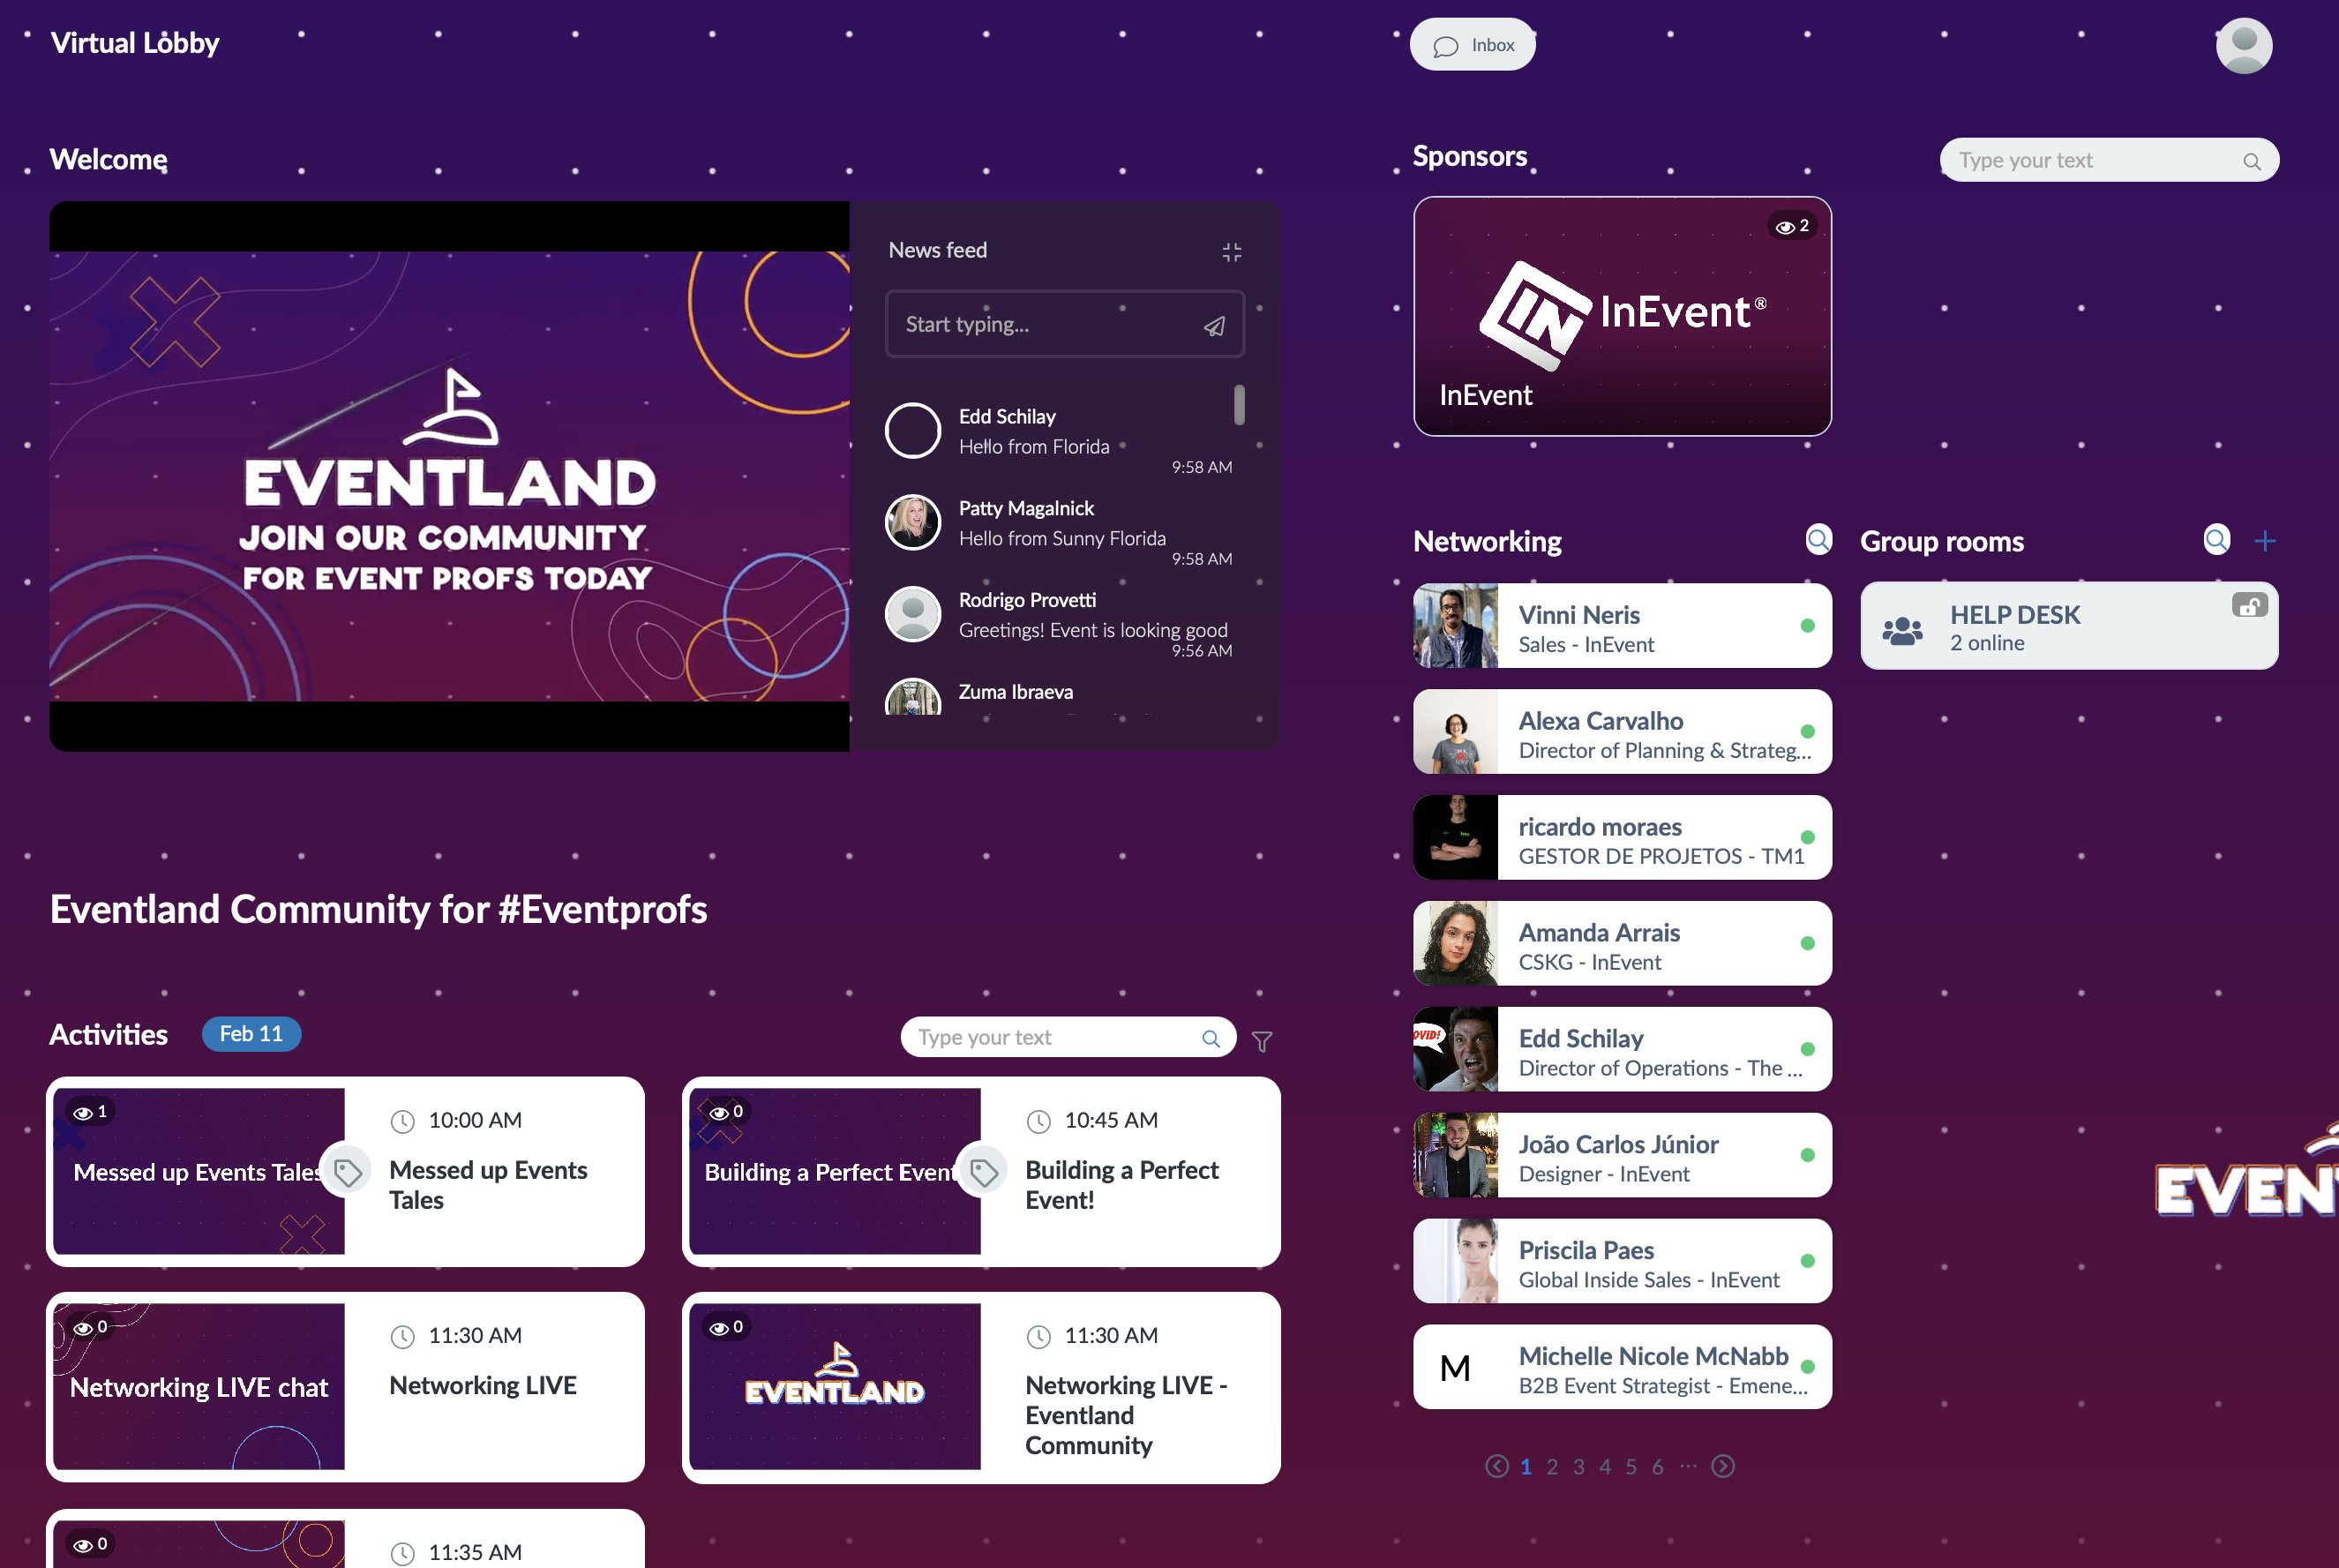 virtuallobbyshowingeventland